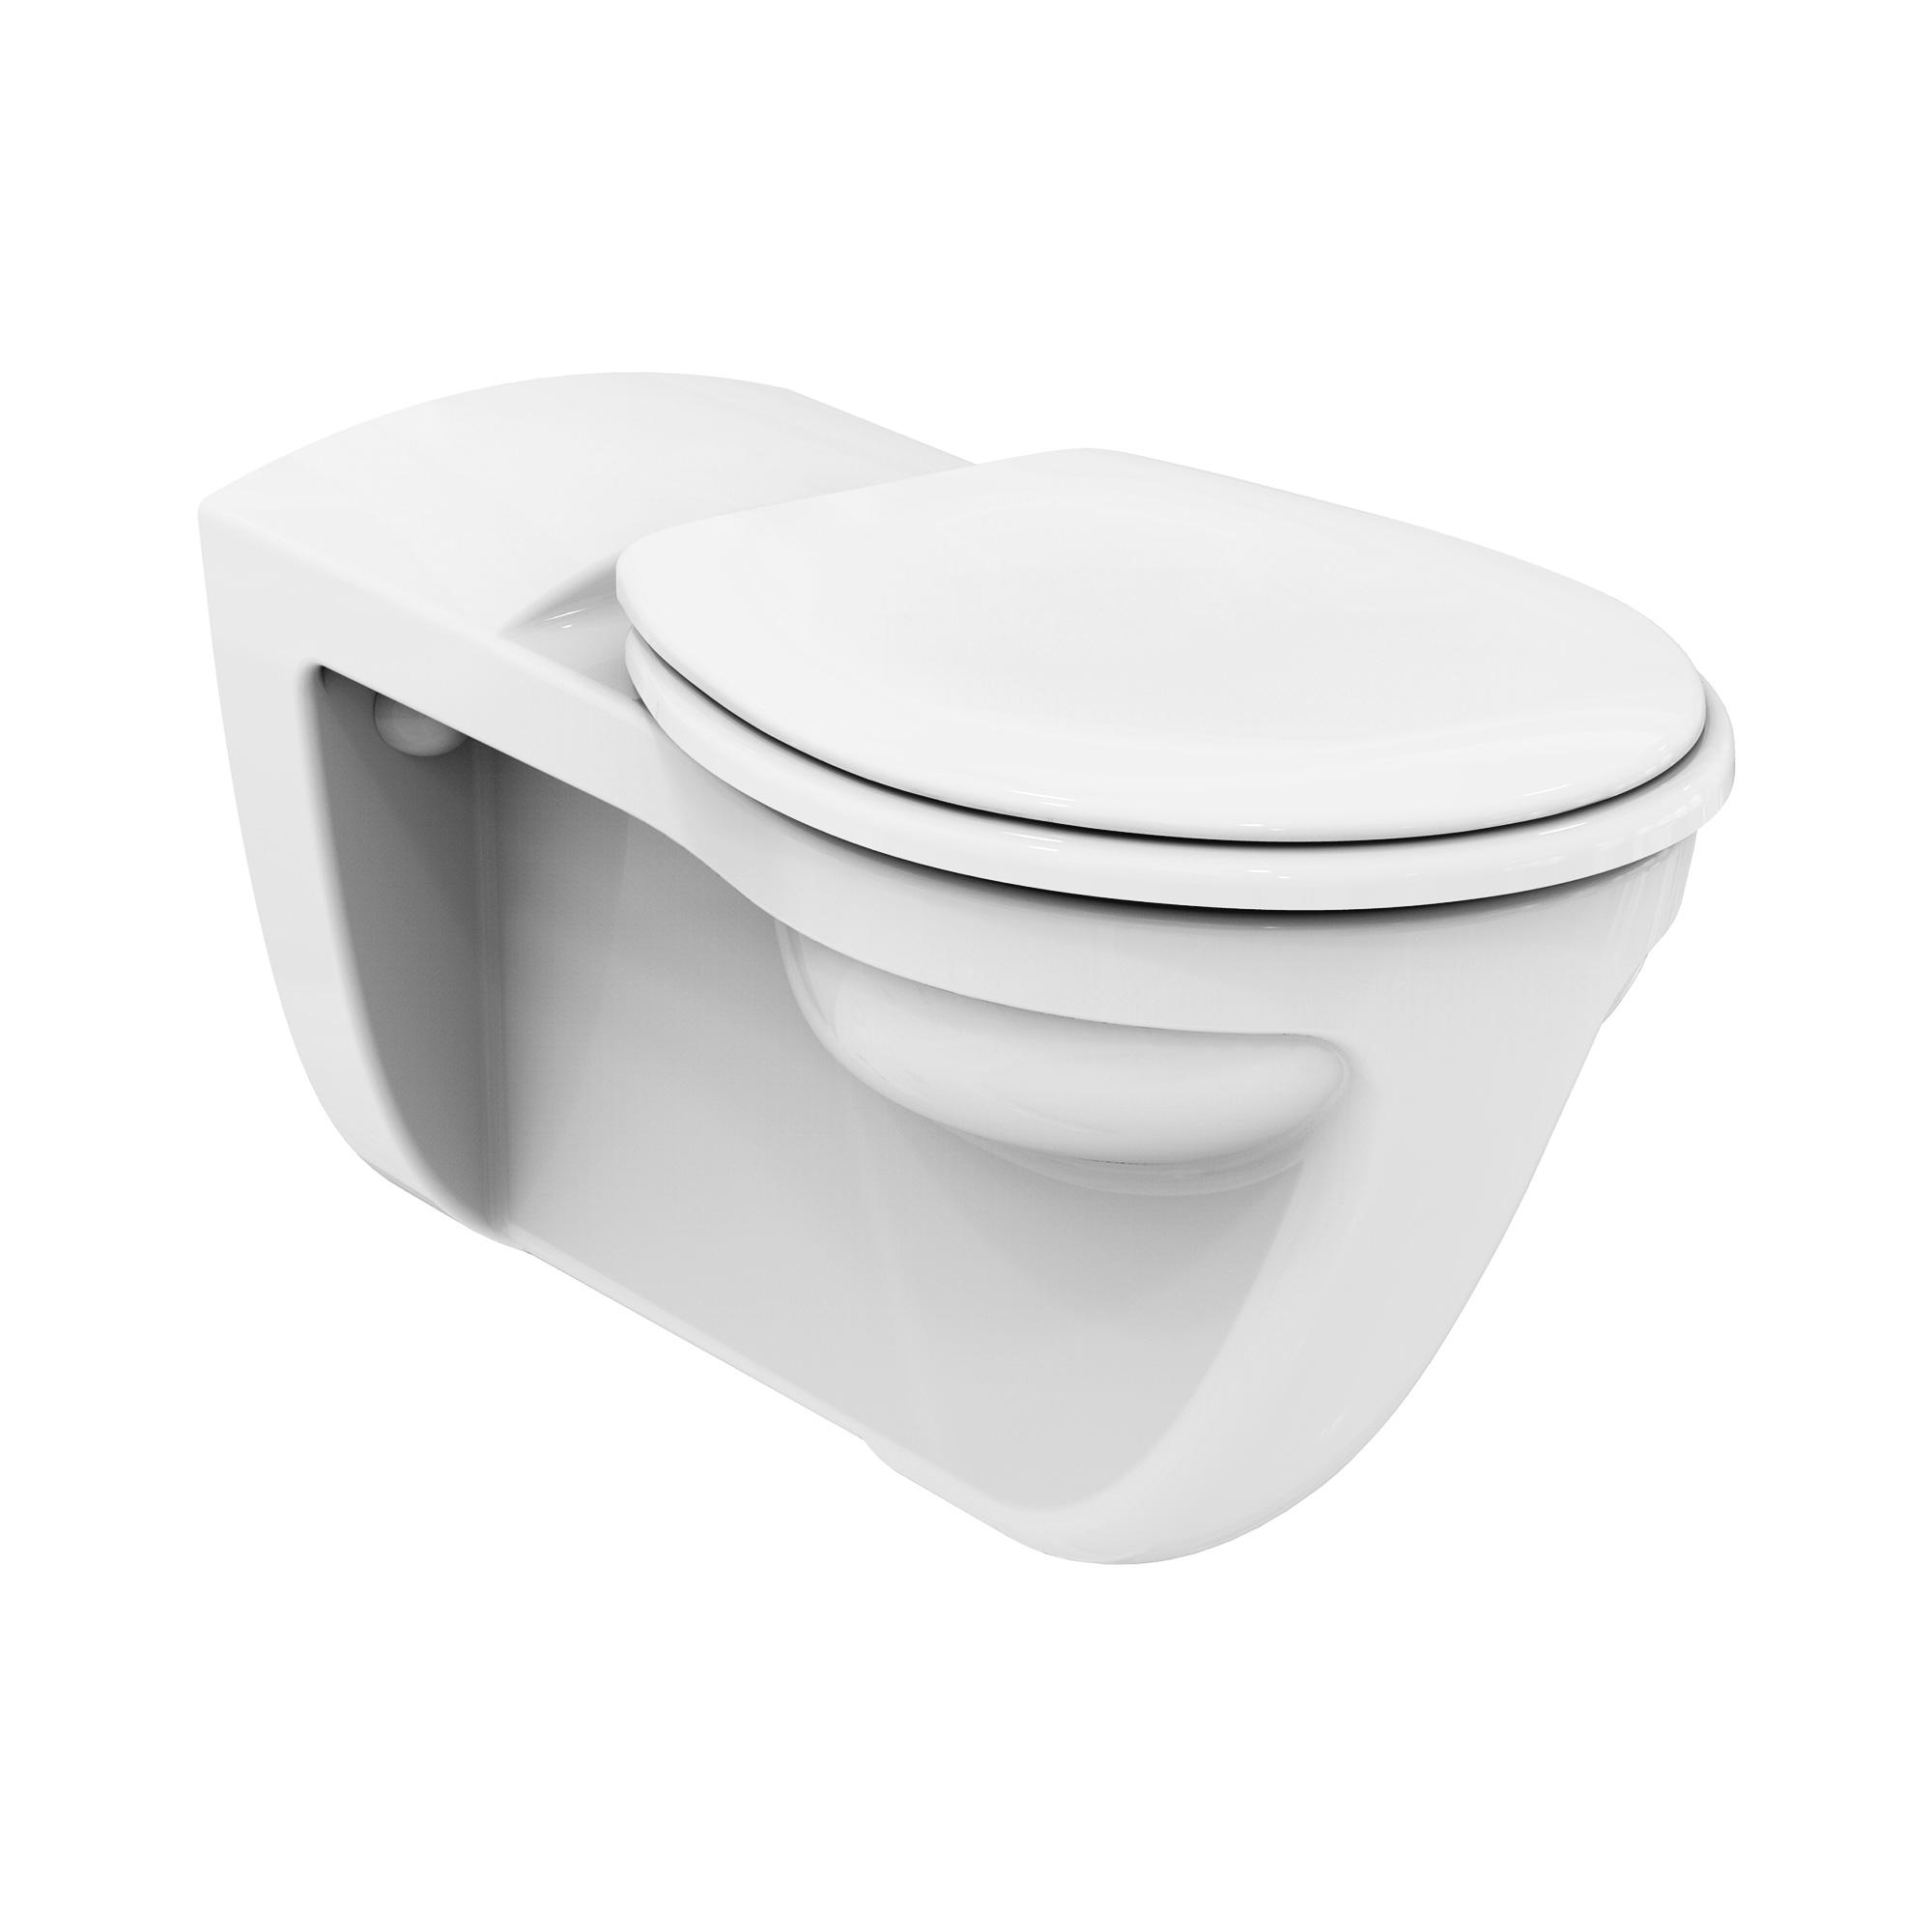 ideal standard contour 21 wandflachsp l wc barrierefrei wei s311101 reuter onlineshop. Black Bedroom Furniture Sets. Home Design Ideas